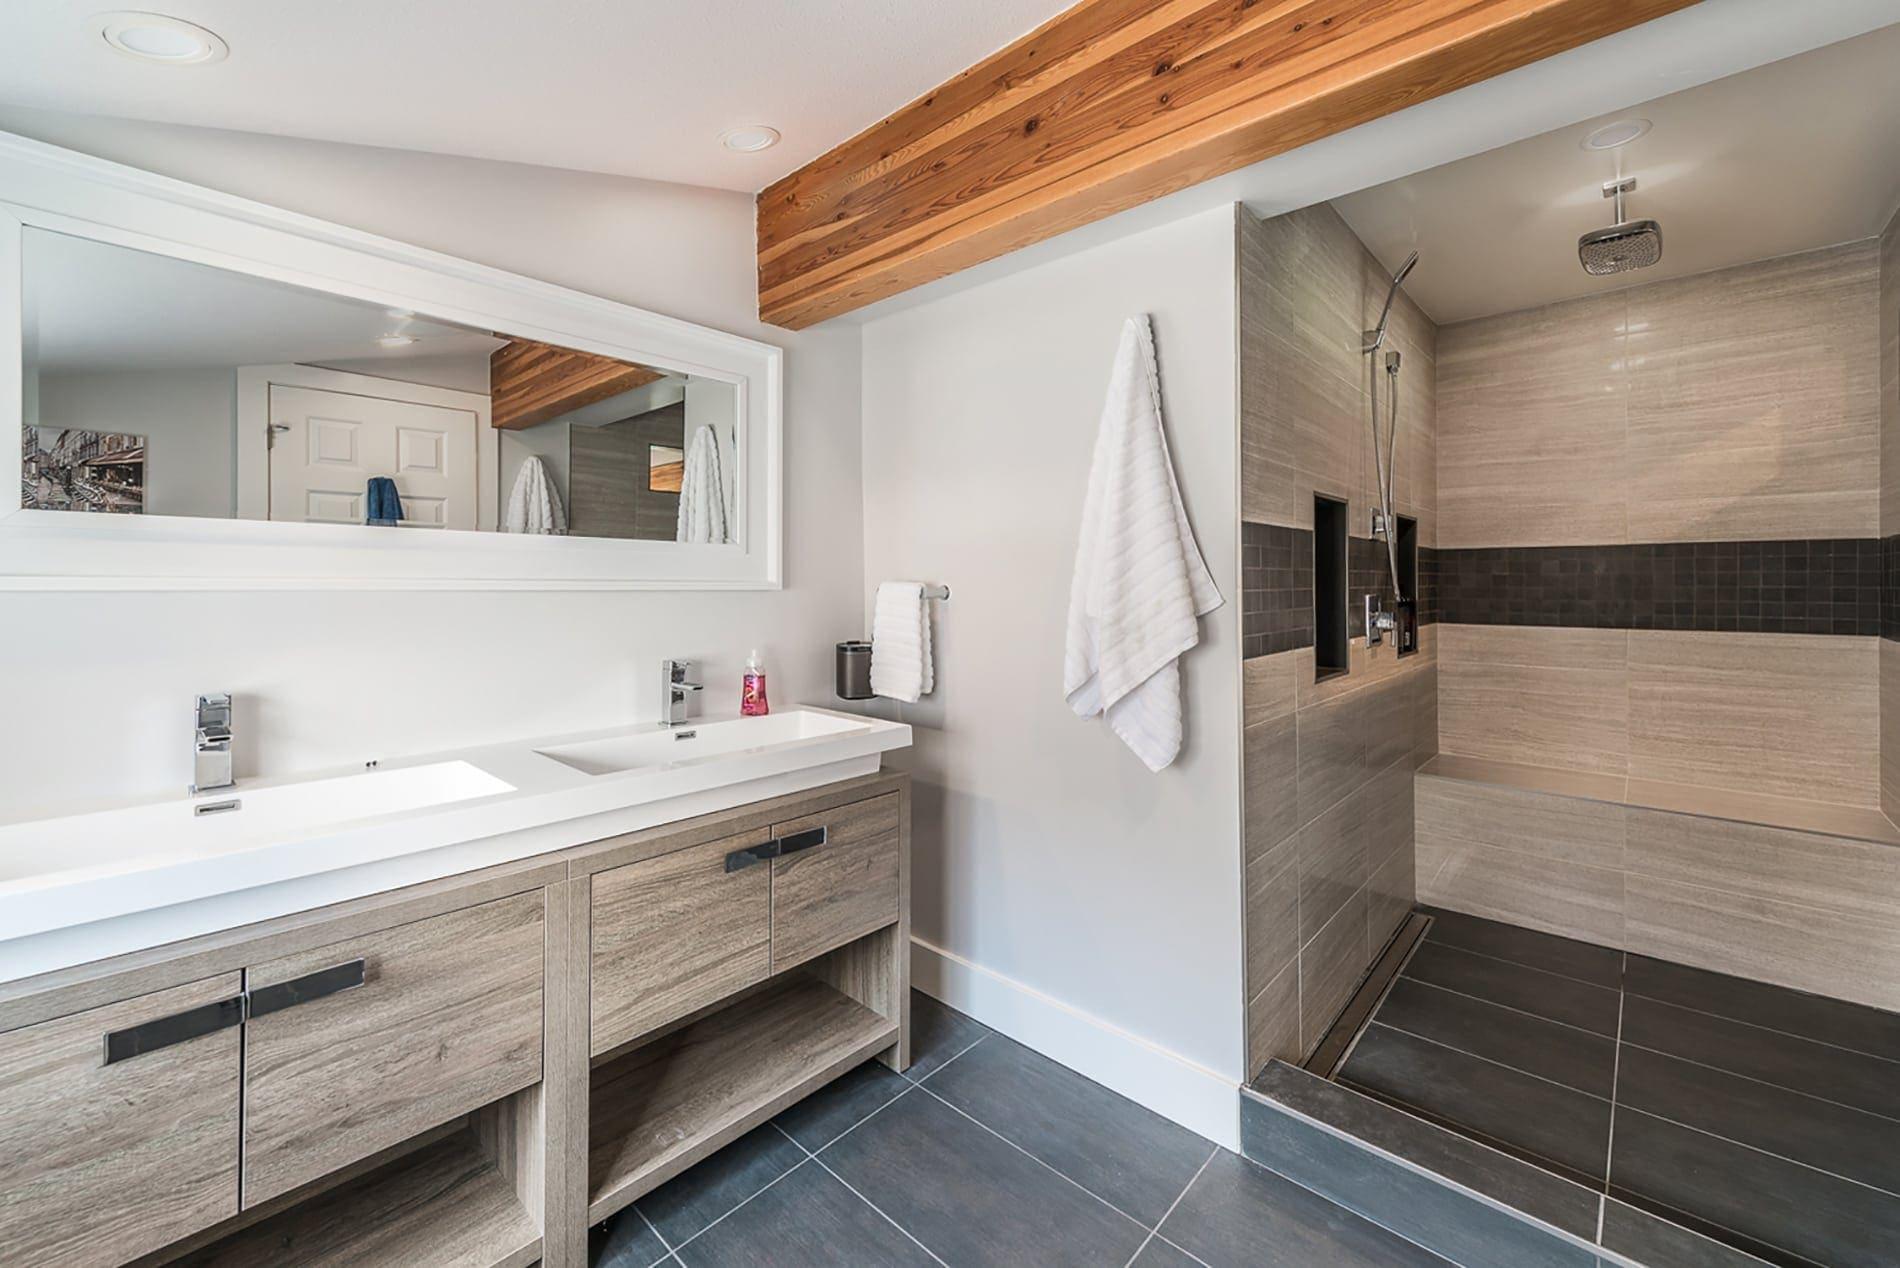 Abbotsford Chilliwack Bathroom Renovations Contractor